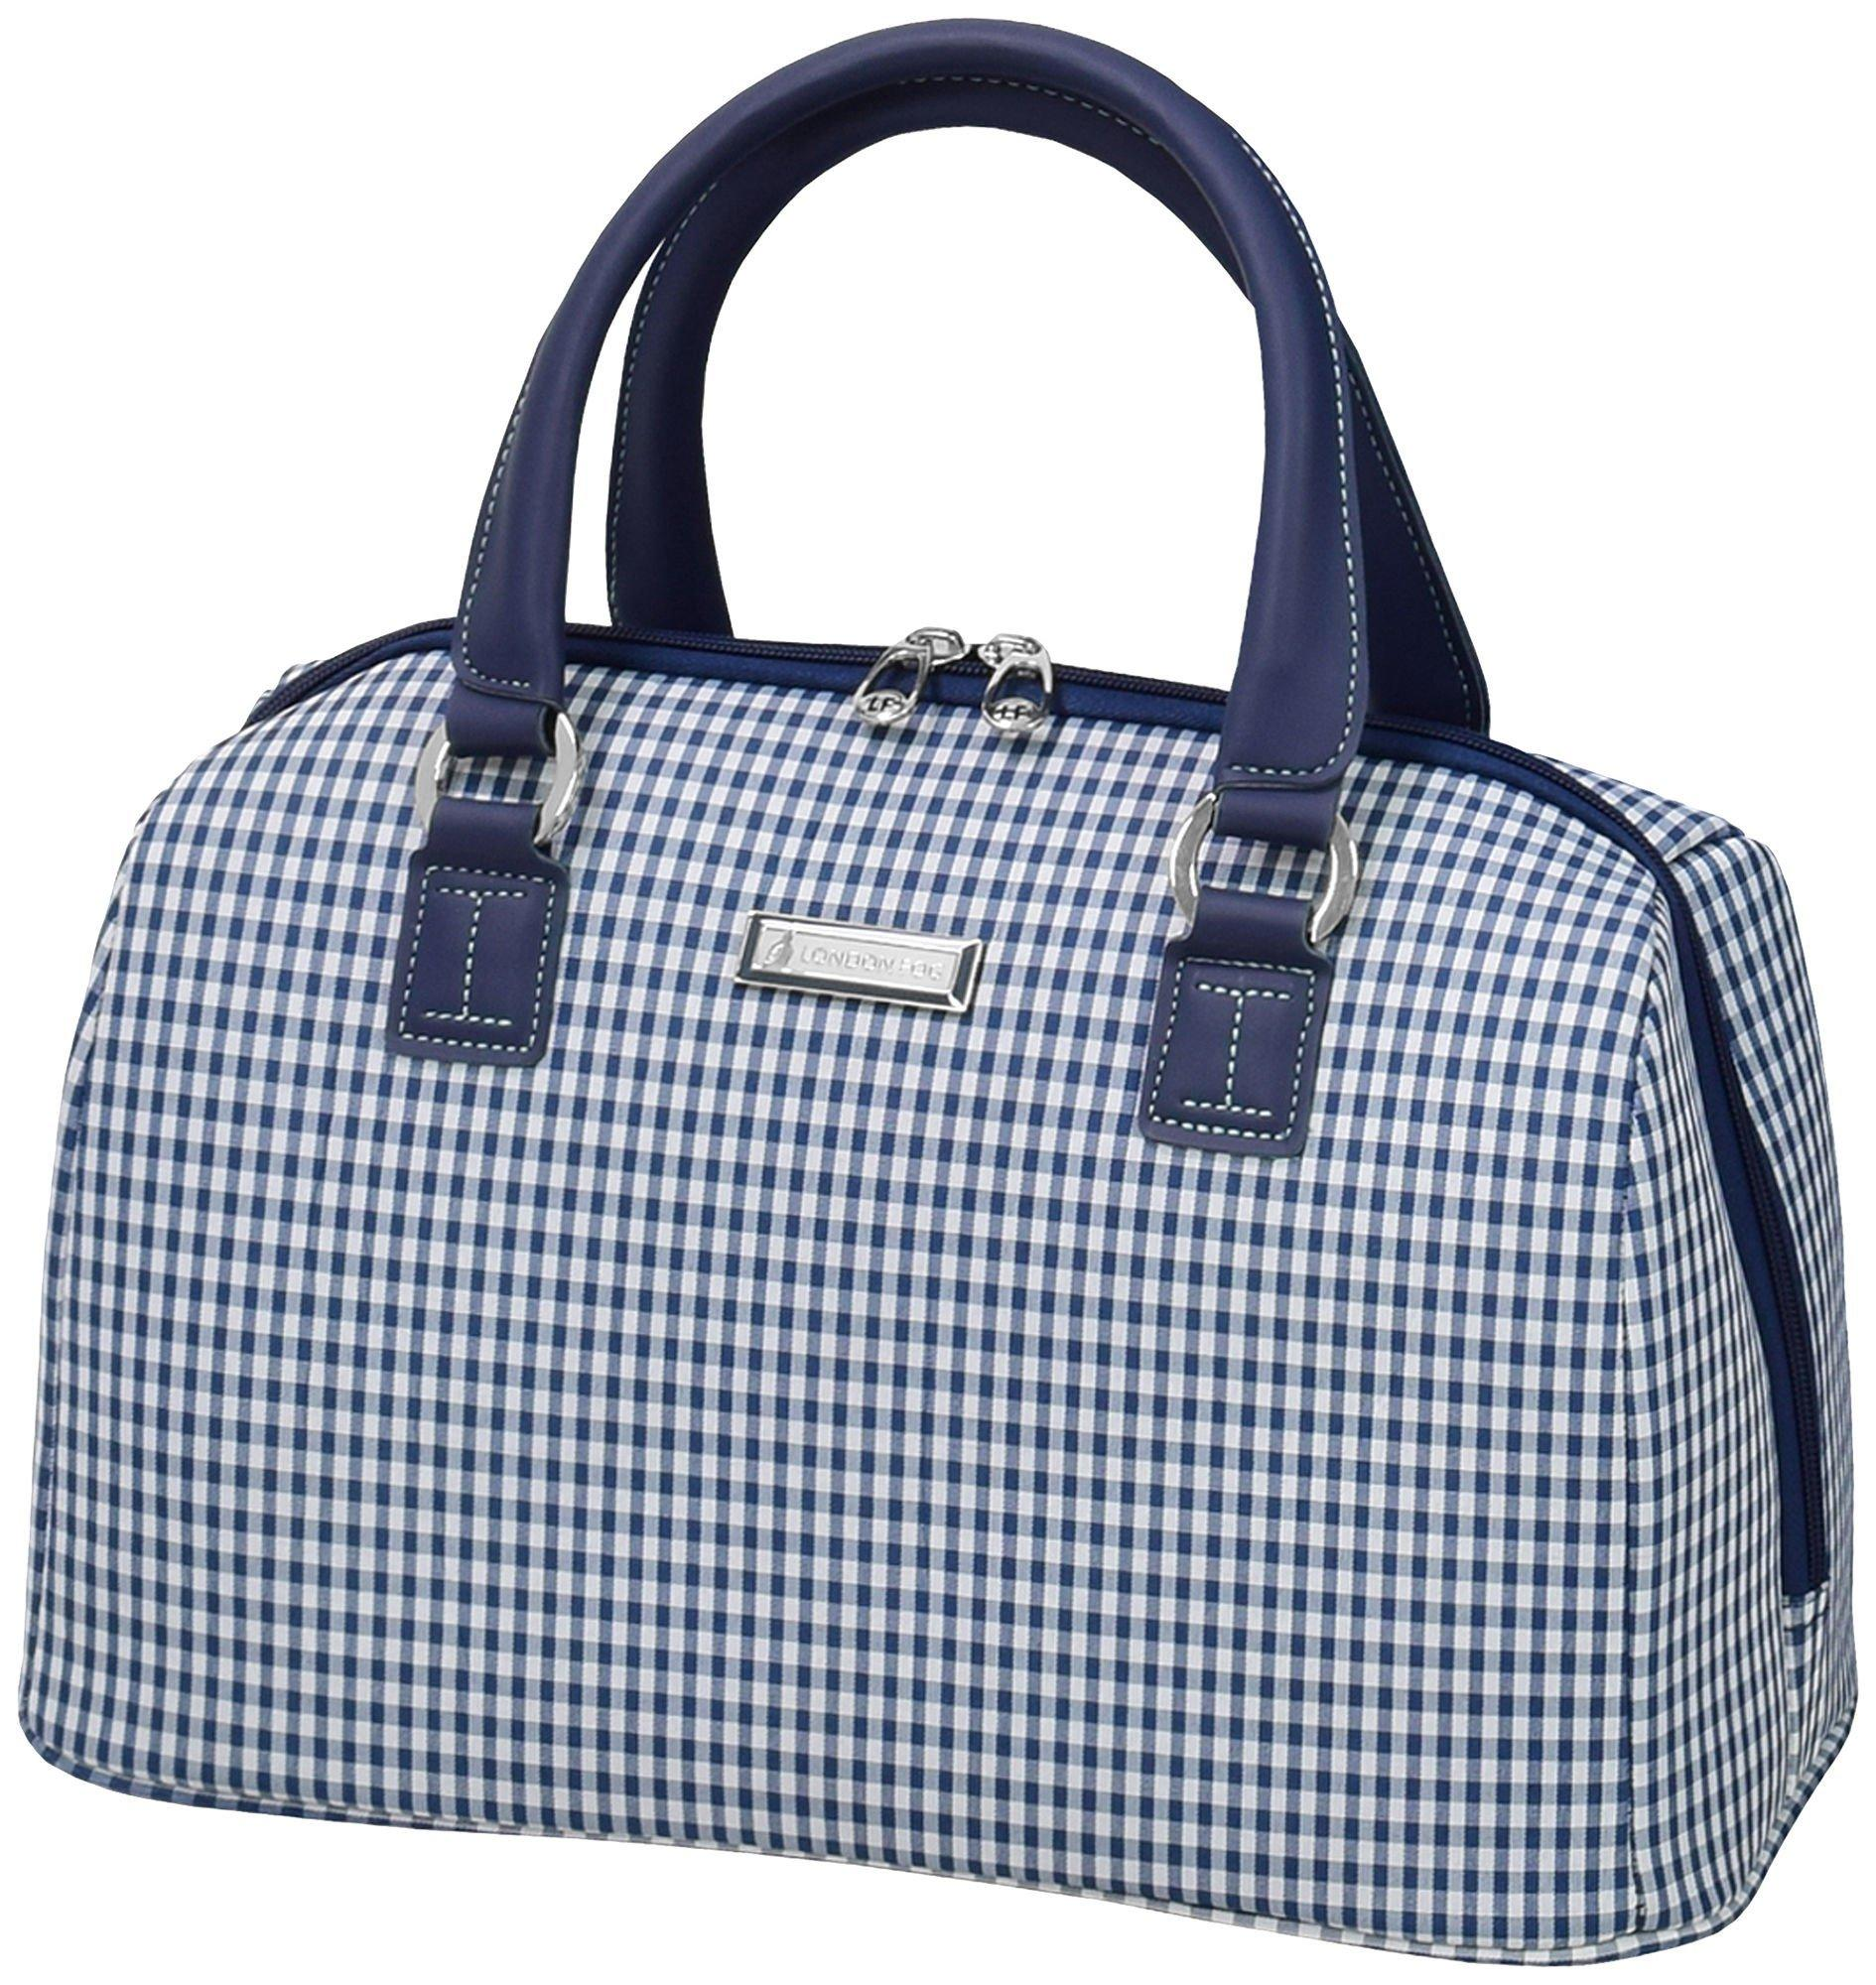 london fog hampton navy gingham satchel bag - London Fog Luggage